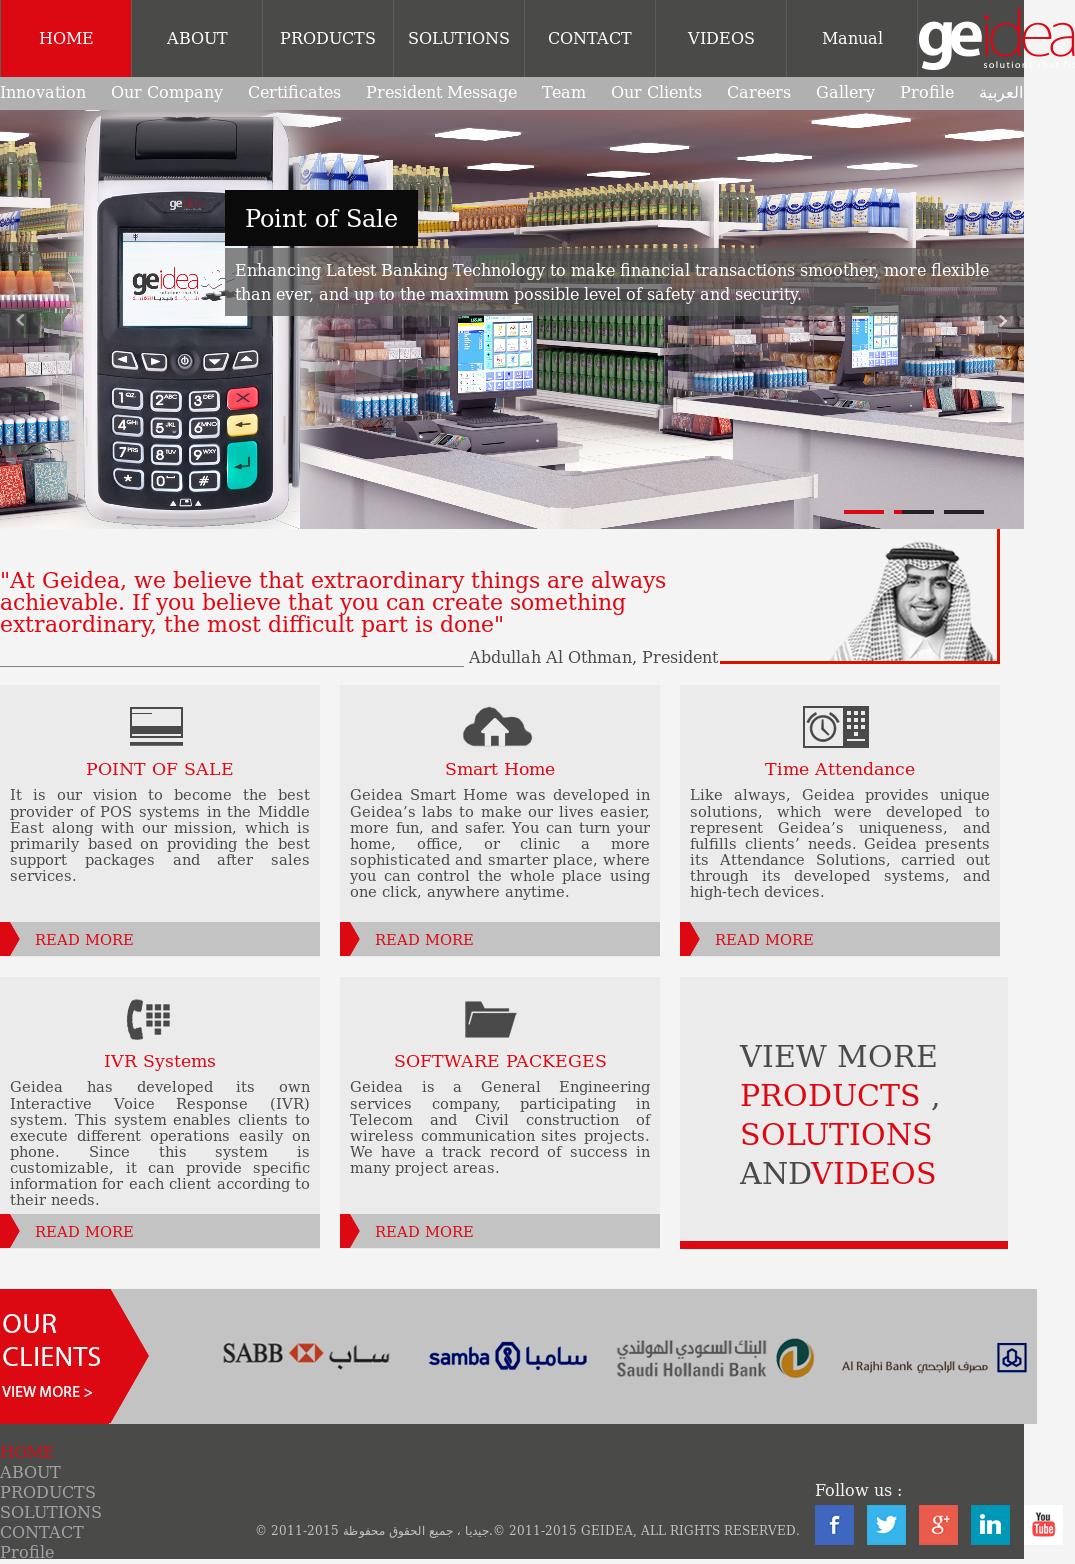 Geidea Competitors, Revenue and Employees - Owler Company Profile